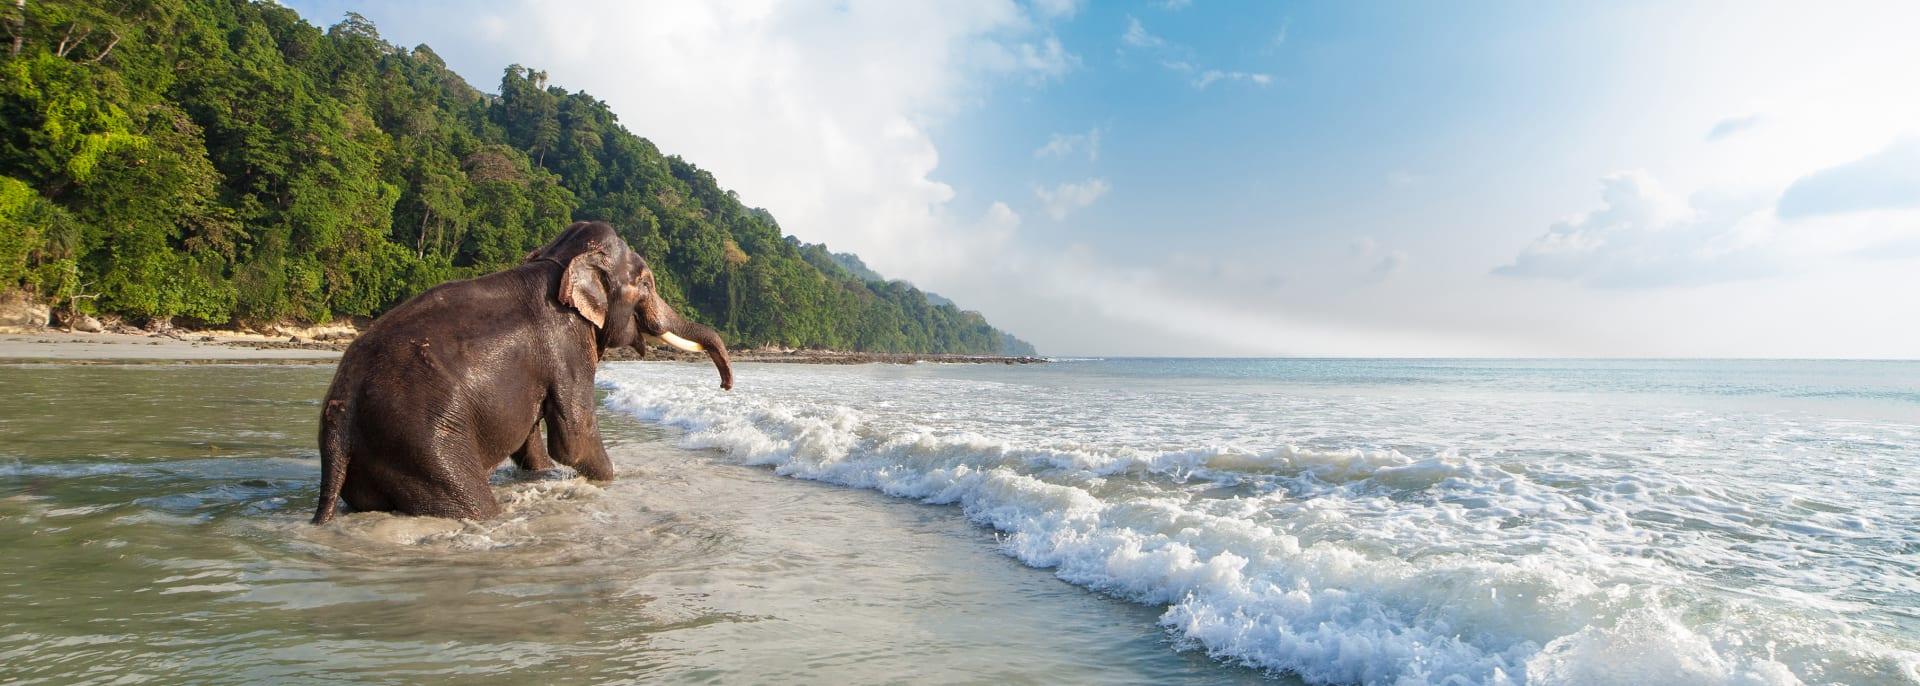 Havelock Insel, Indien